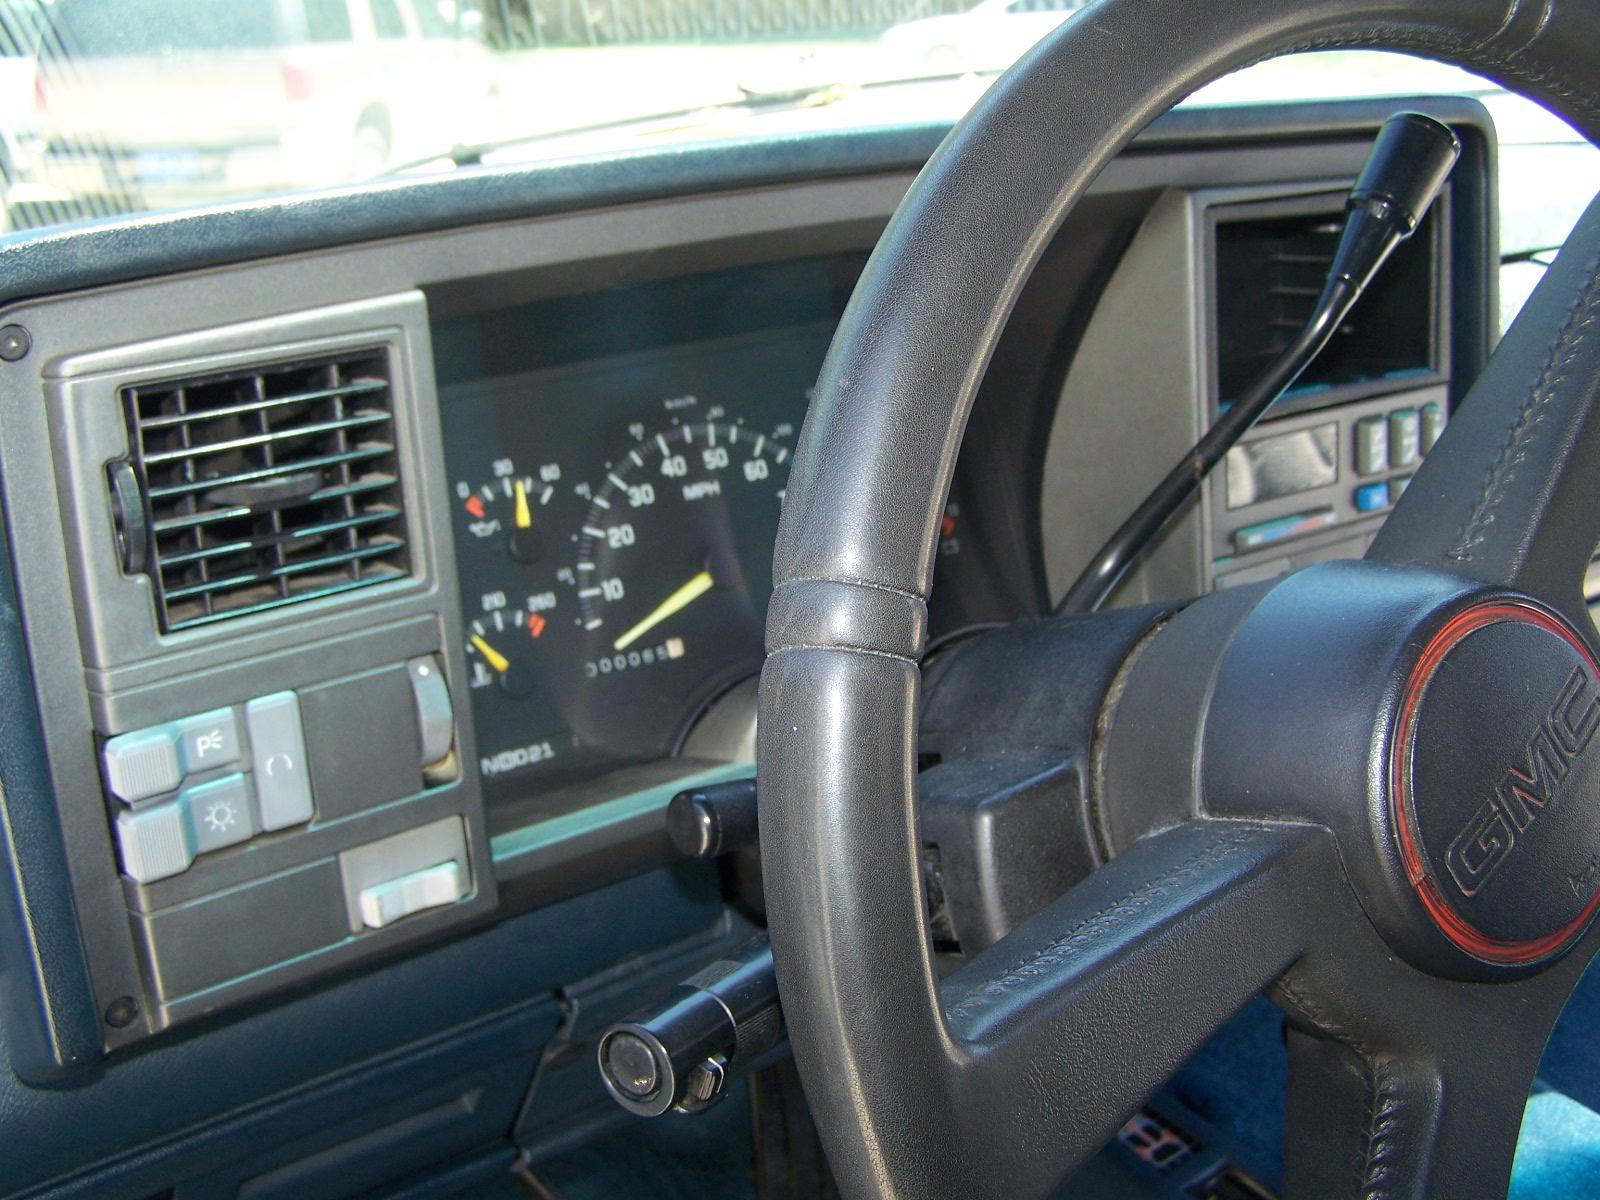 1993 GMC Yukon 010.JPG